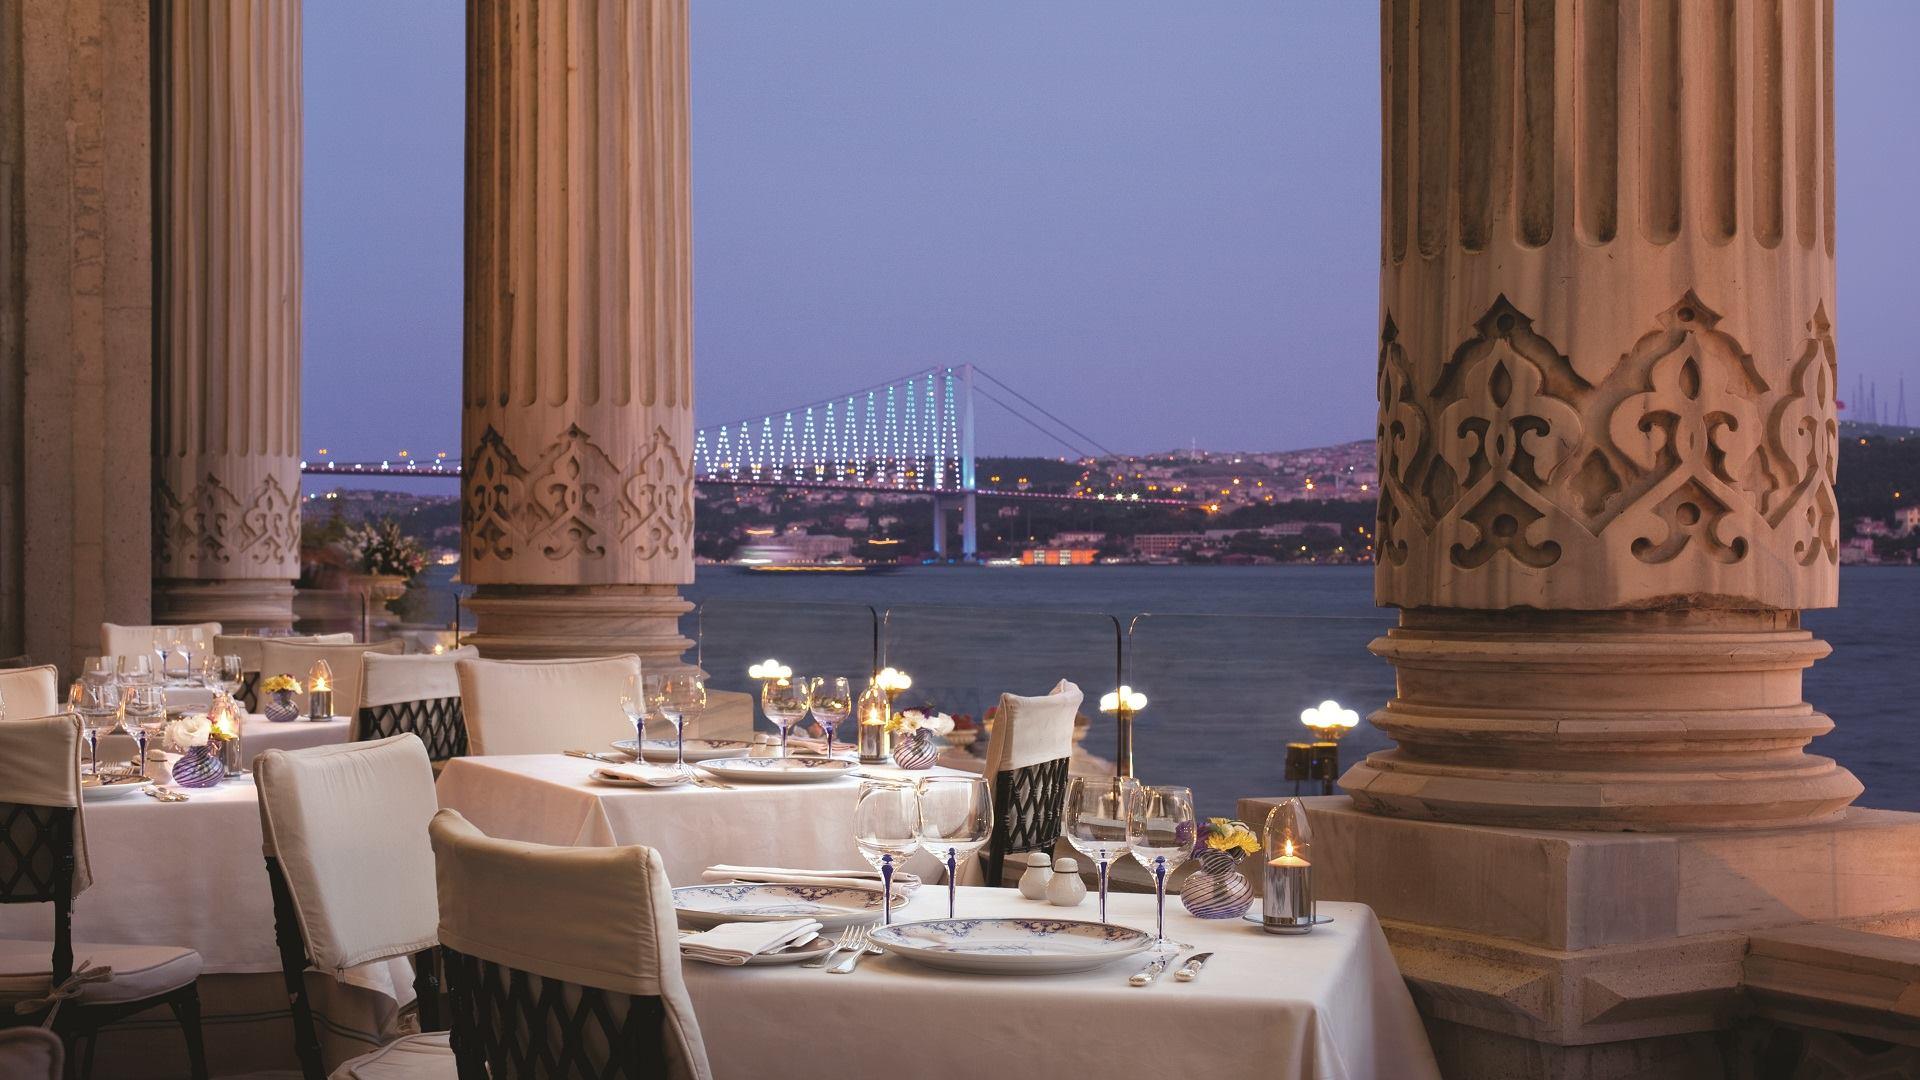 Best hotels in europe 2014 world travel awards for Best hotel awards